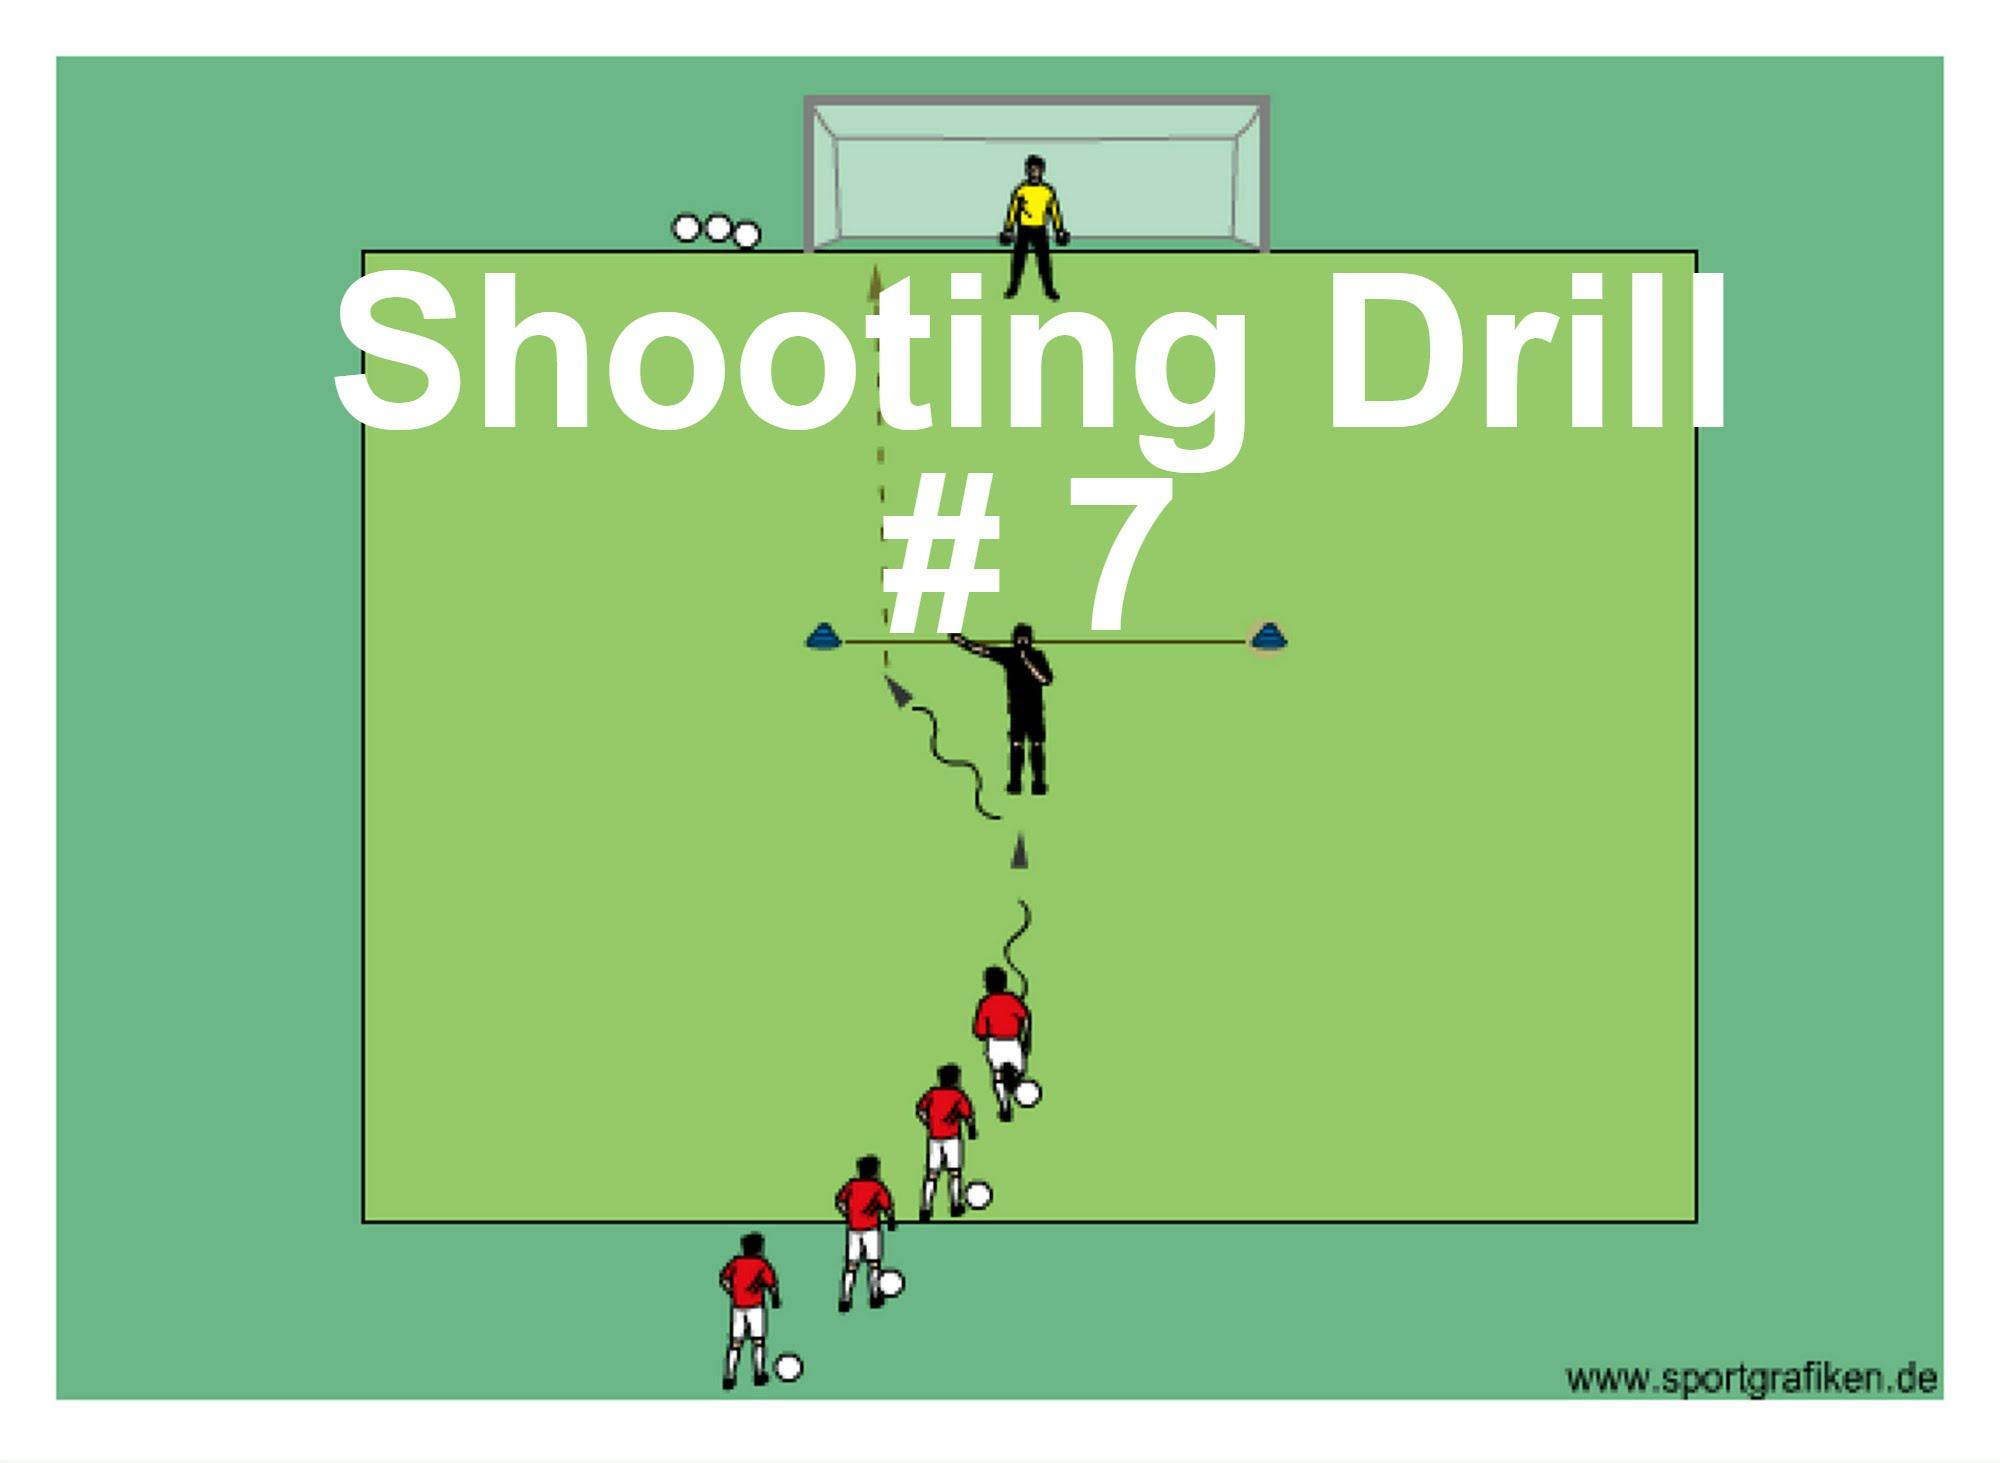 Fun Shooting Drill Shooting Tips: Soccer Shooting And Skills Techniques